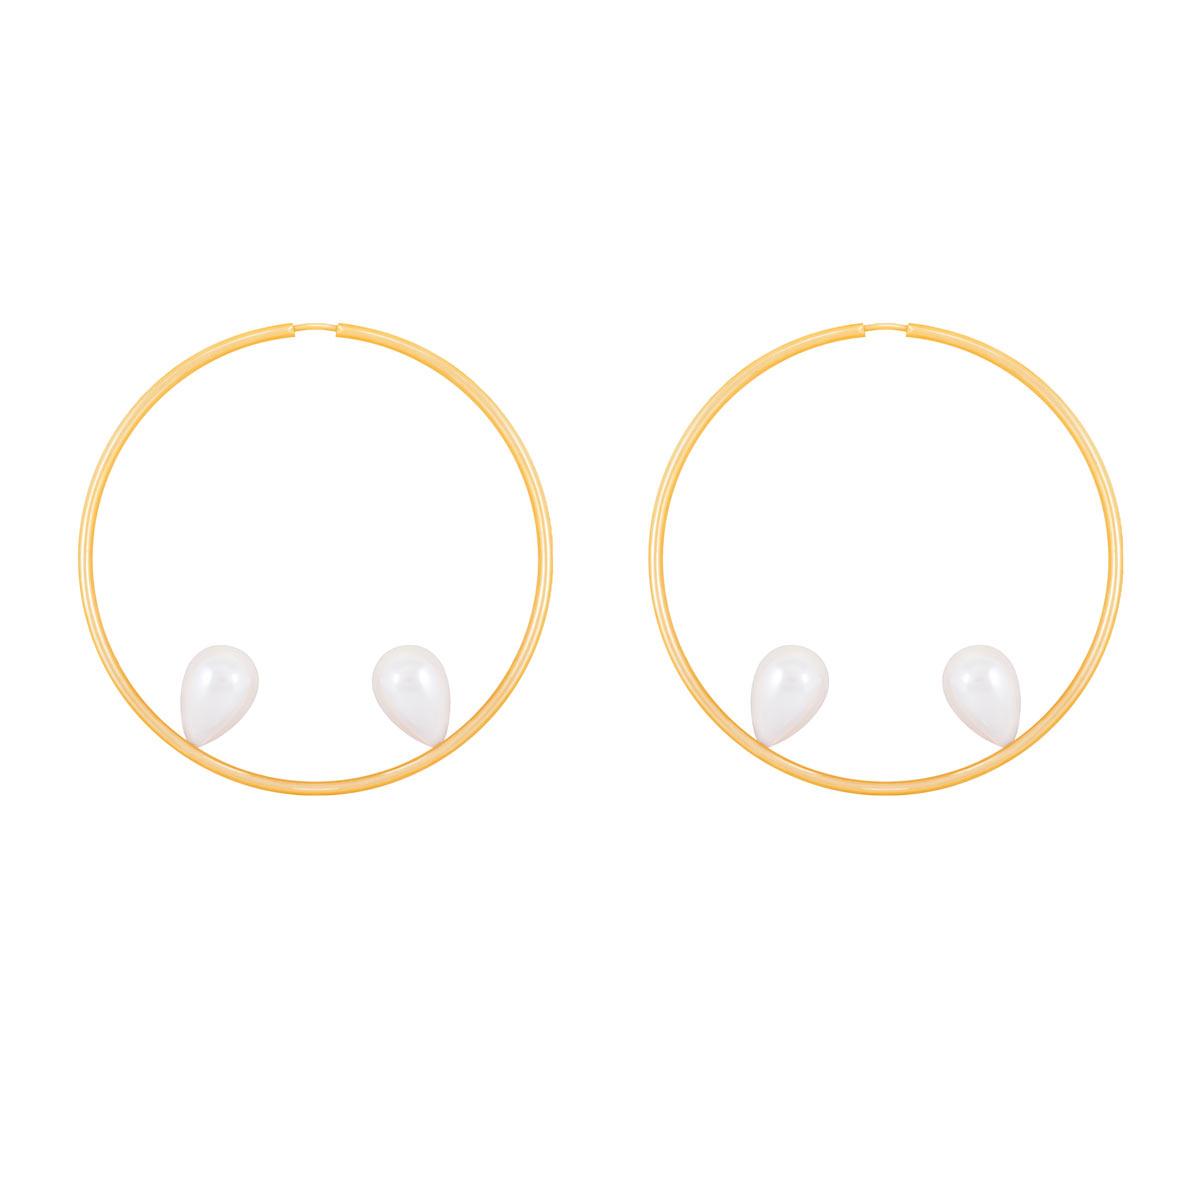 گوشواره طلا حلقه و مروارید